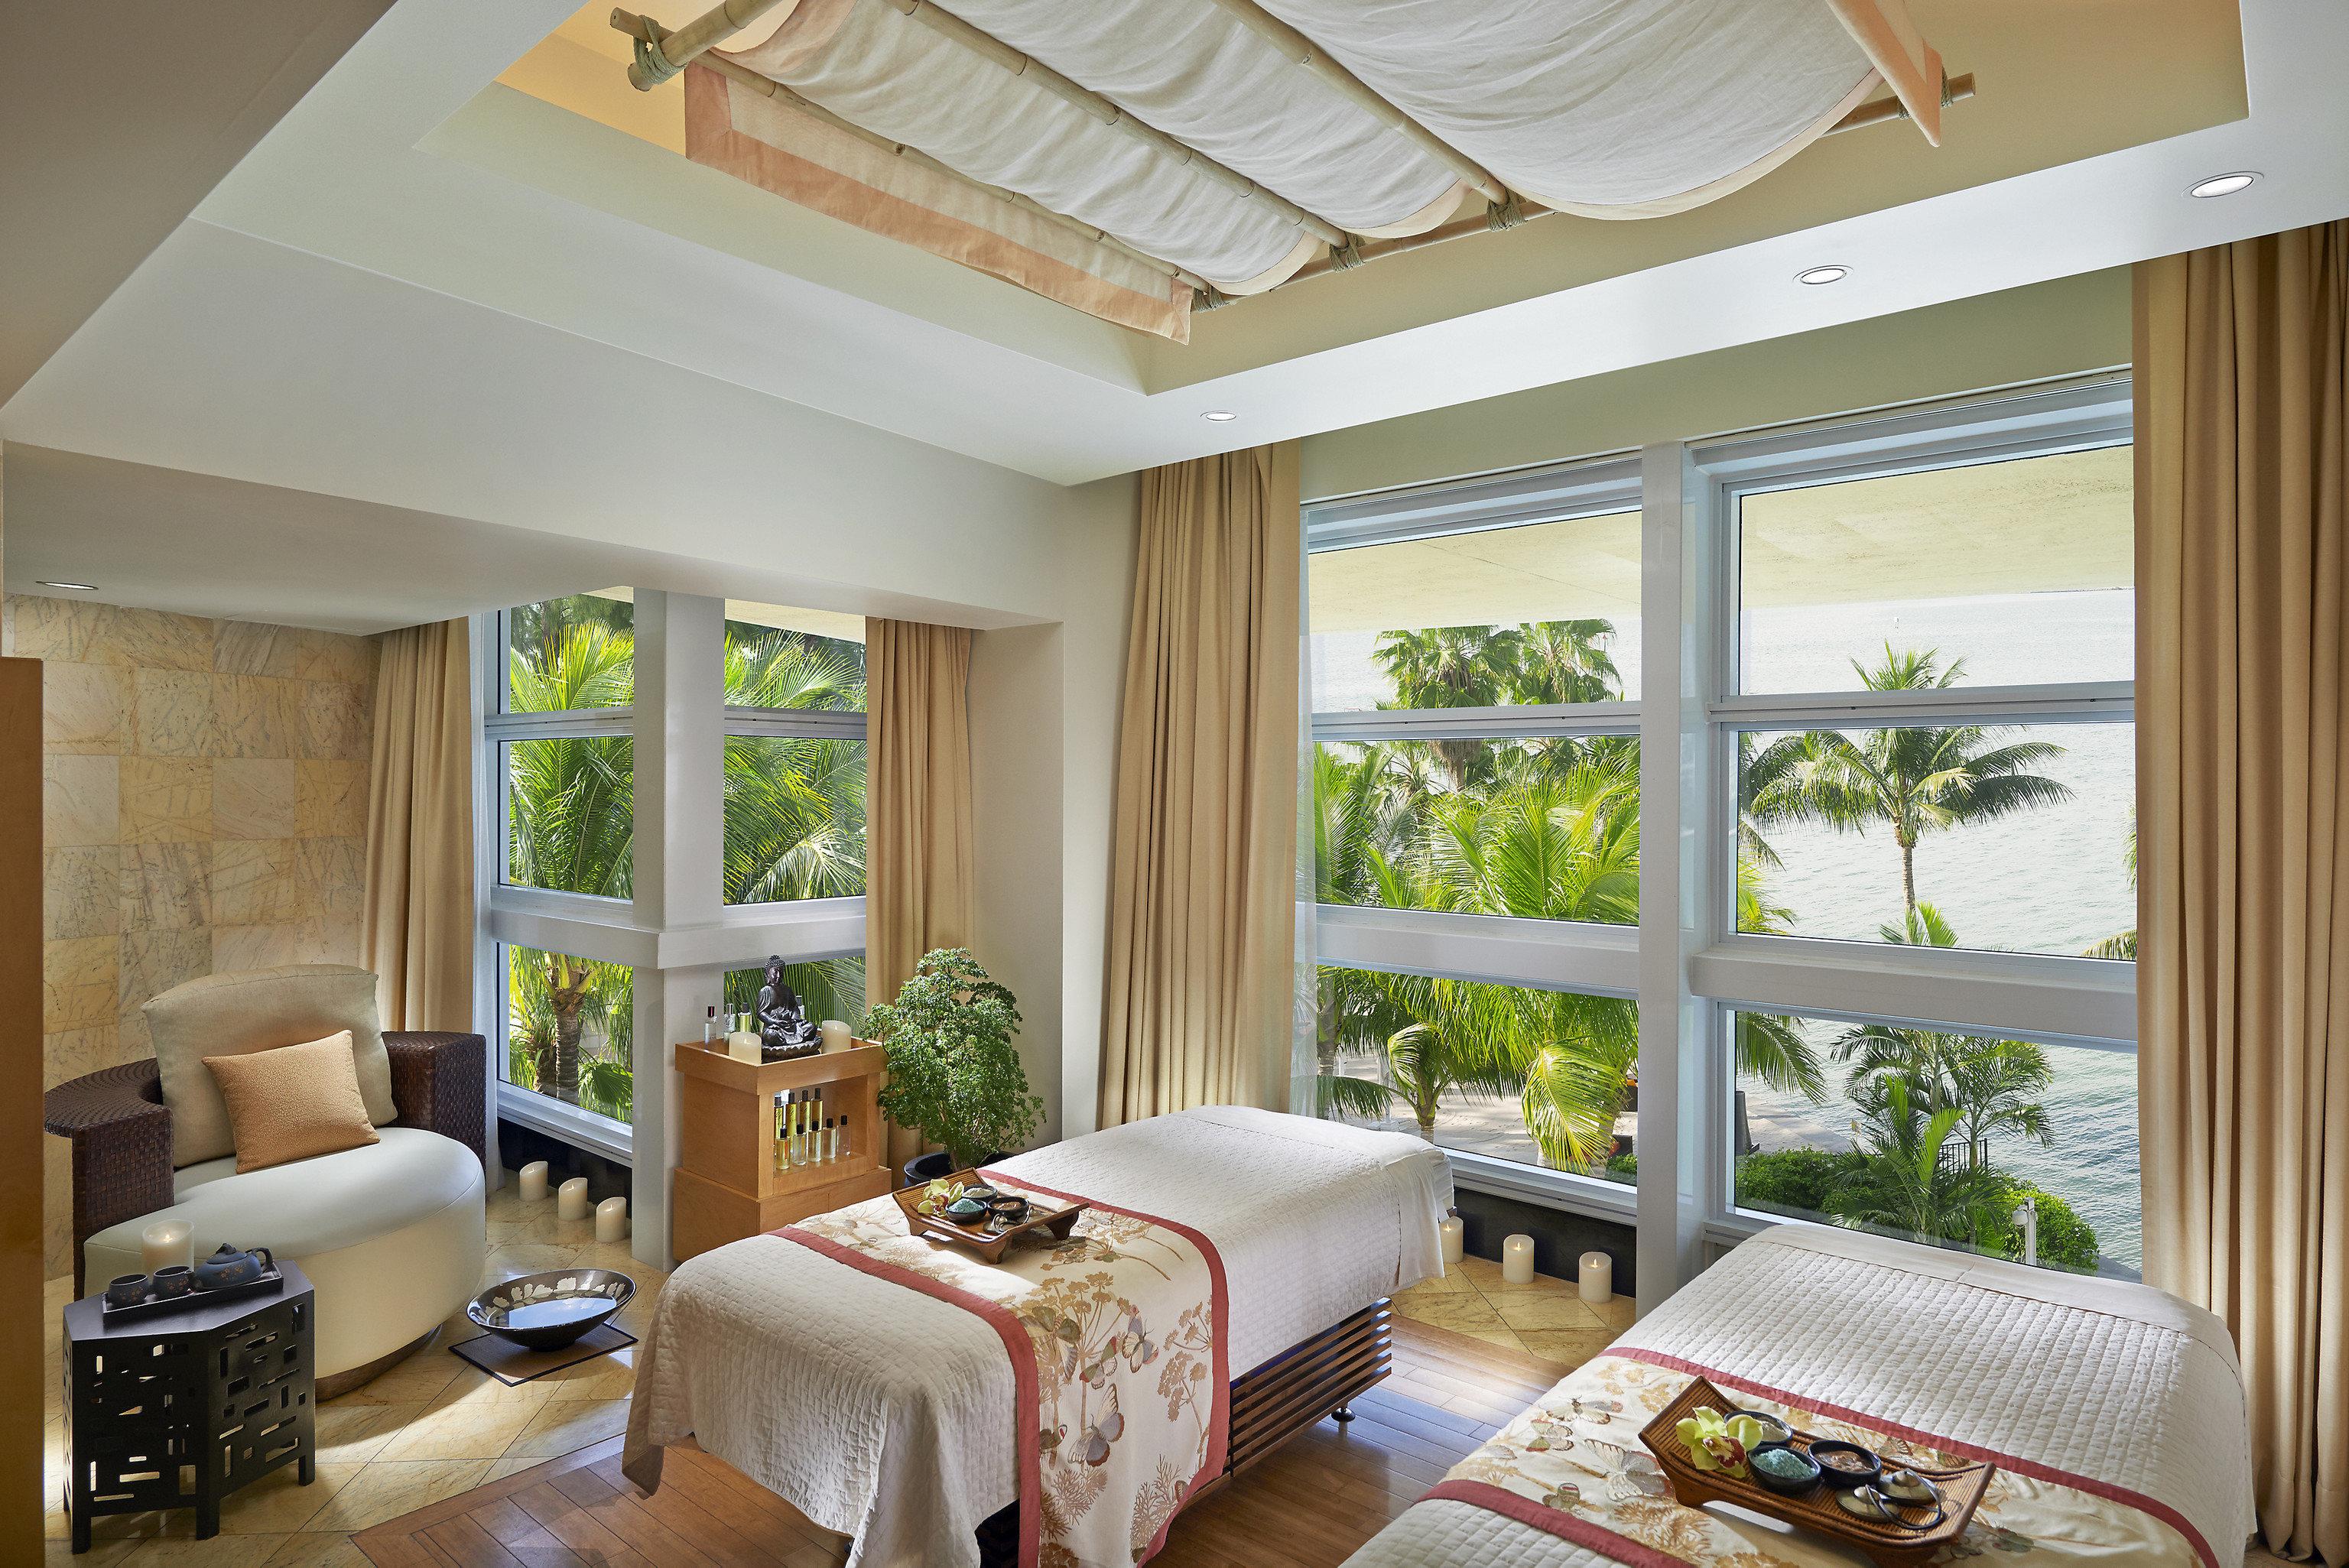 City Hotels Luxury Miami Miami Beach Bedroom window treatment home daylighting living room interior designer house Suite